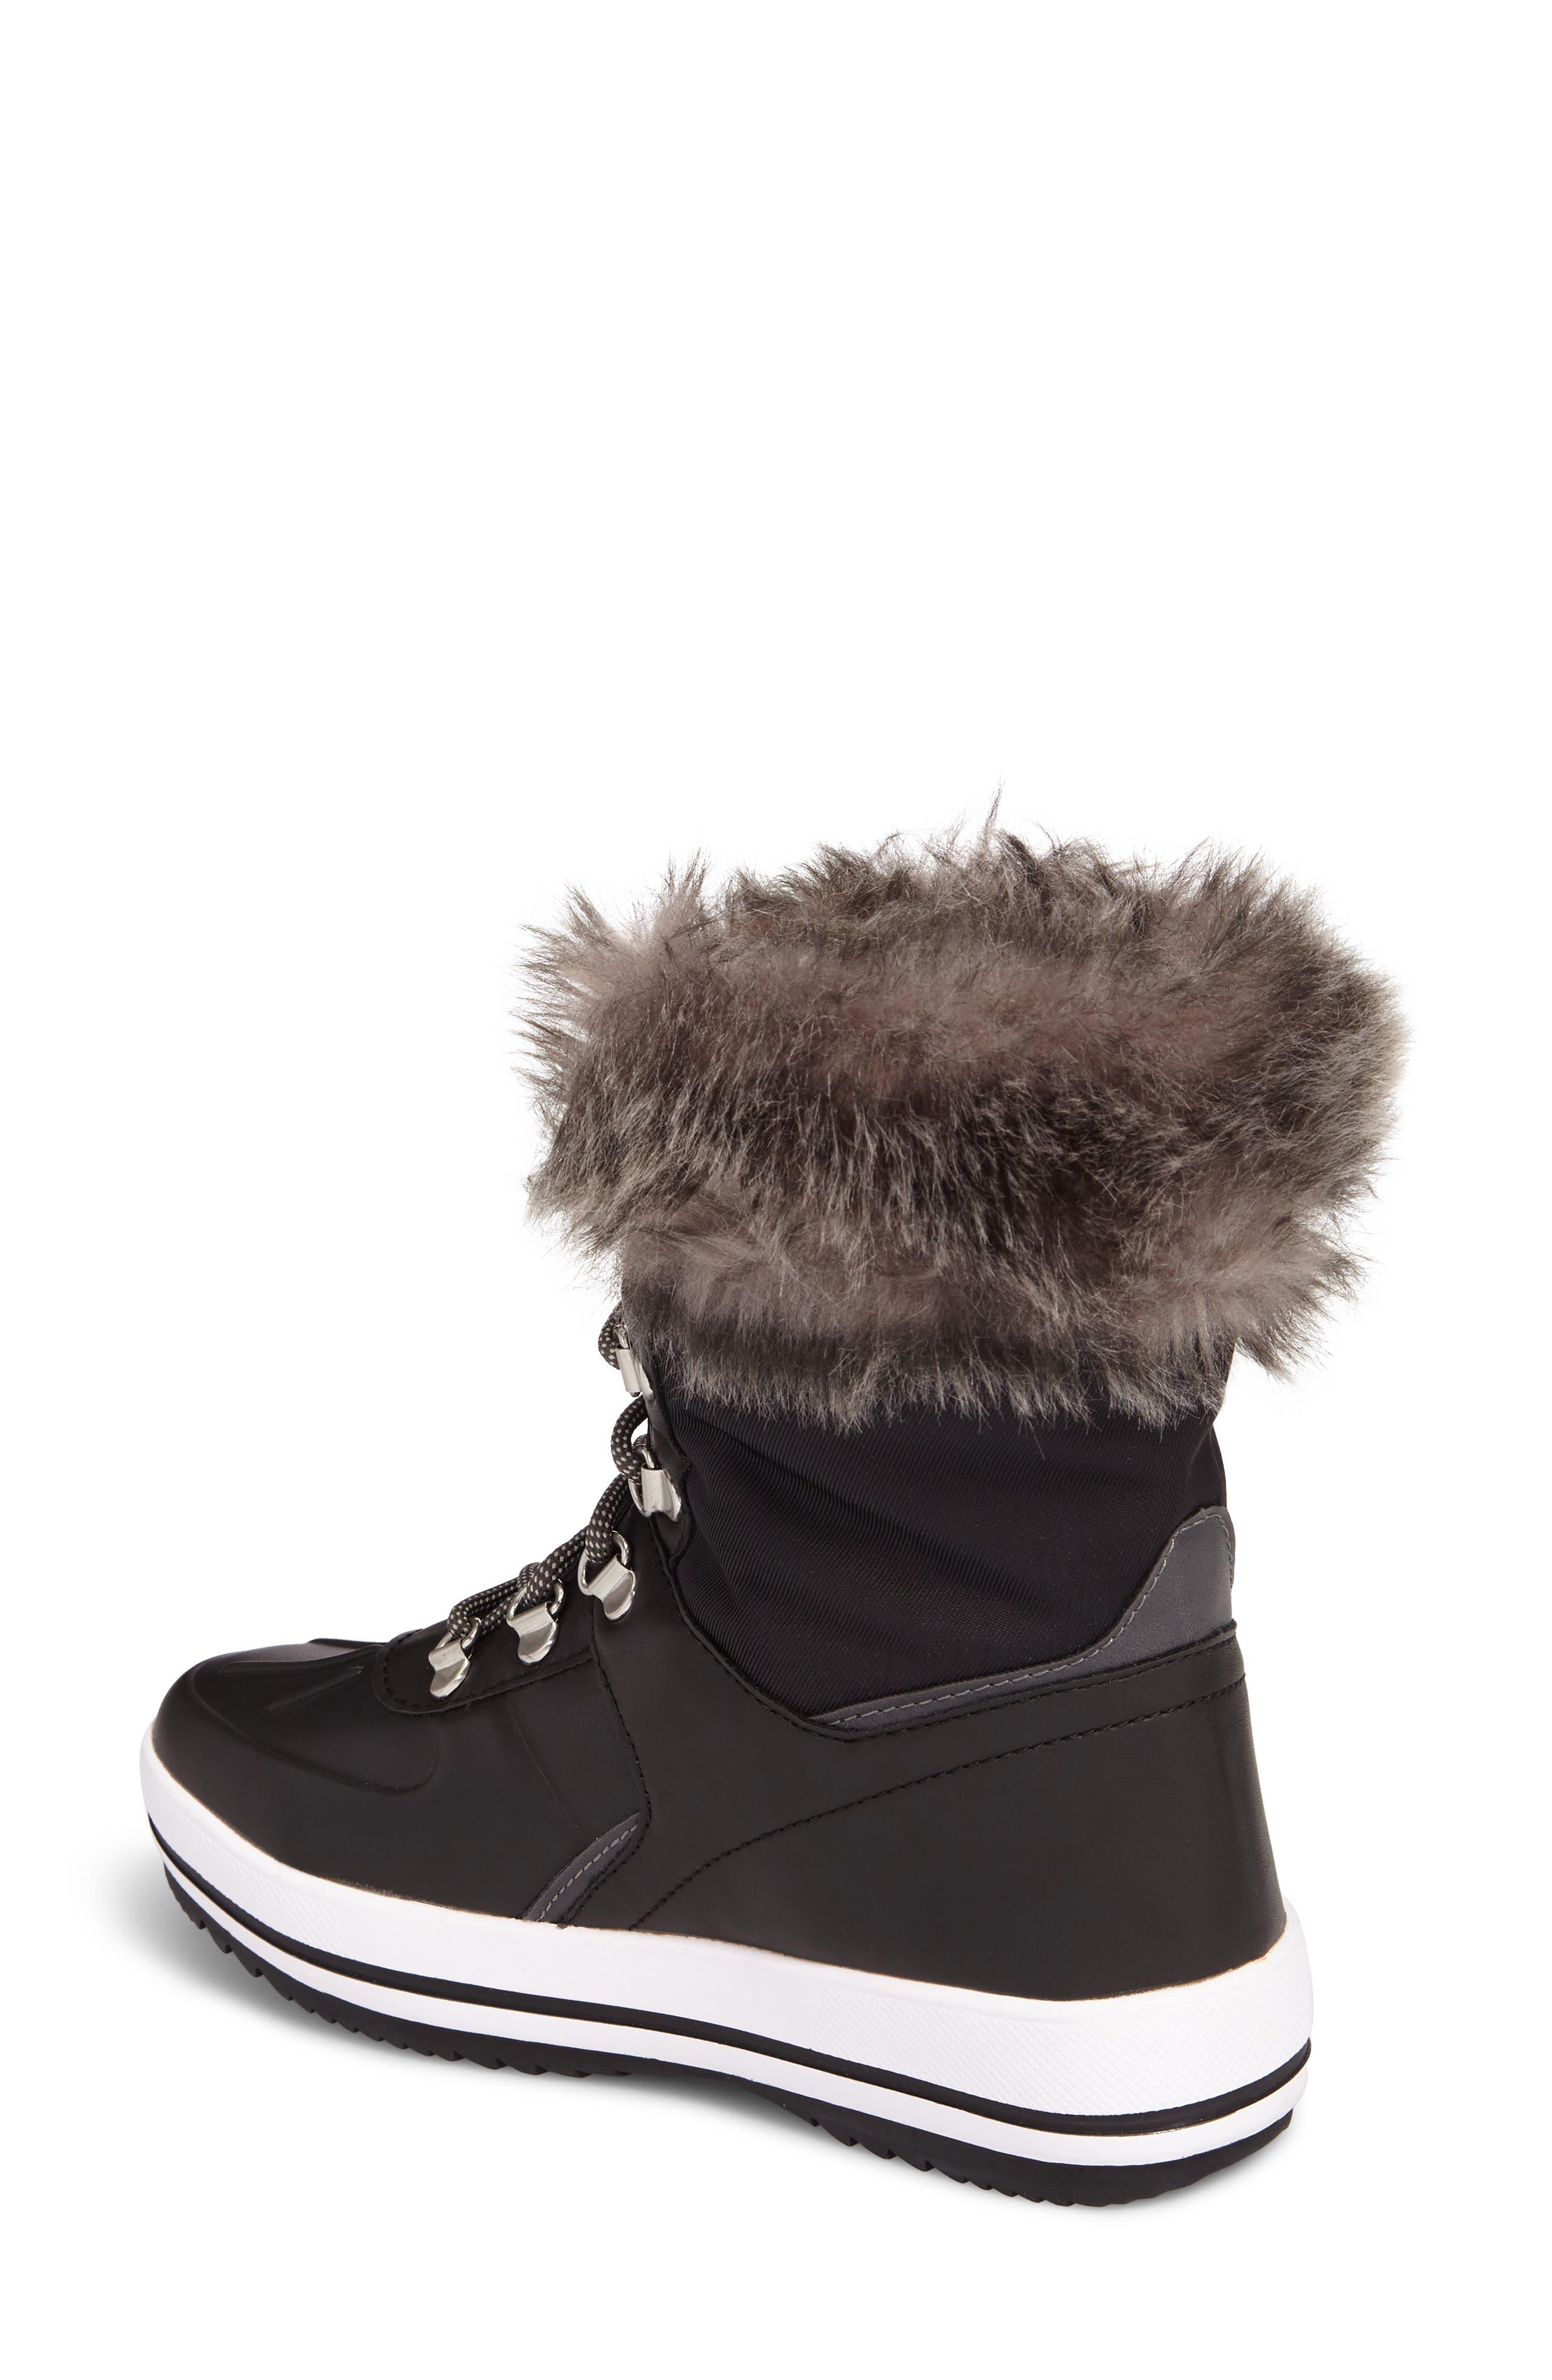 Viper Waterproof Snow Boot with Faux Fur Trim,                             Alternate thumbnail 2, color,                             BLACK